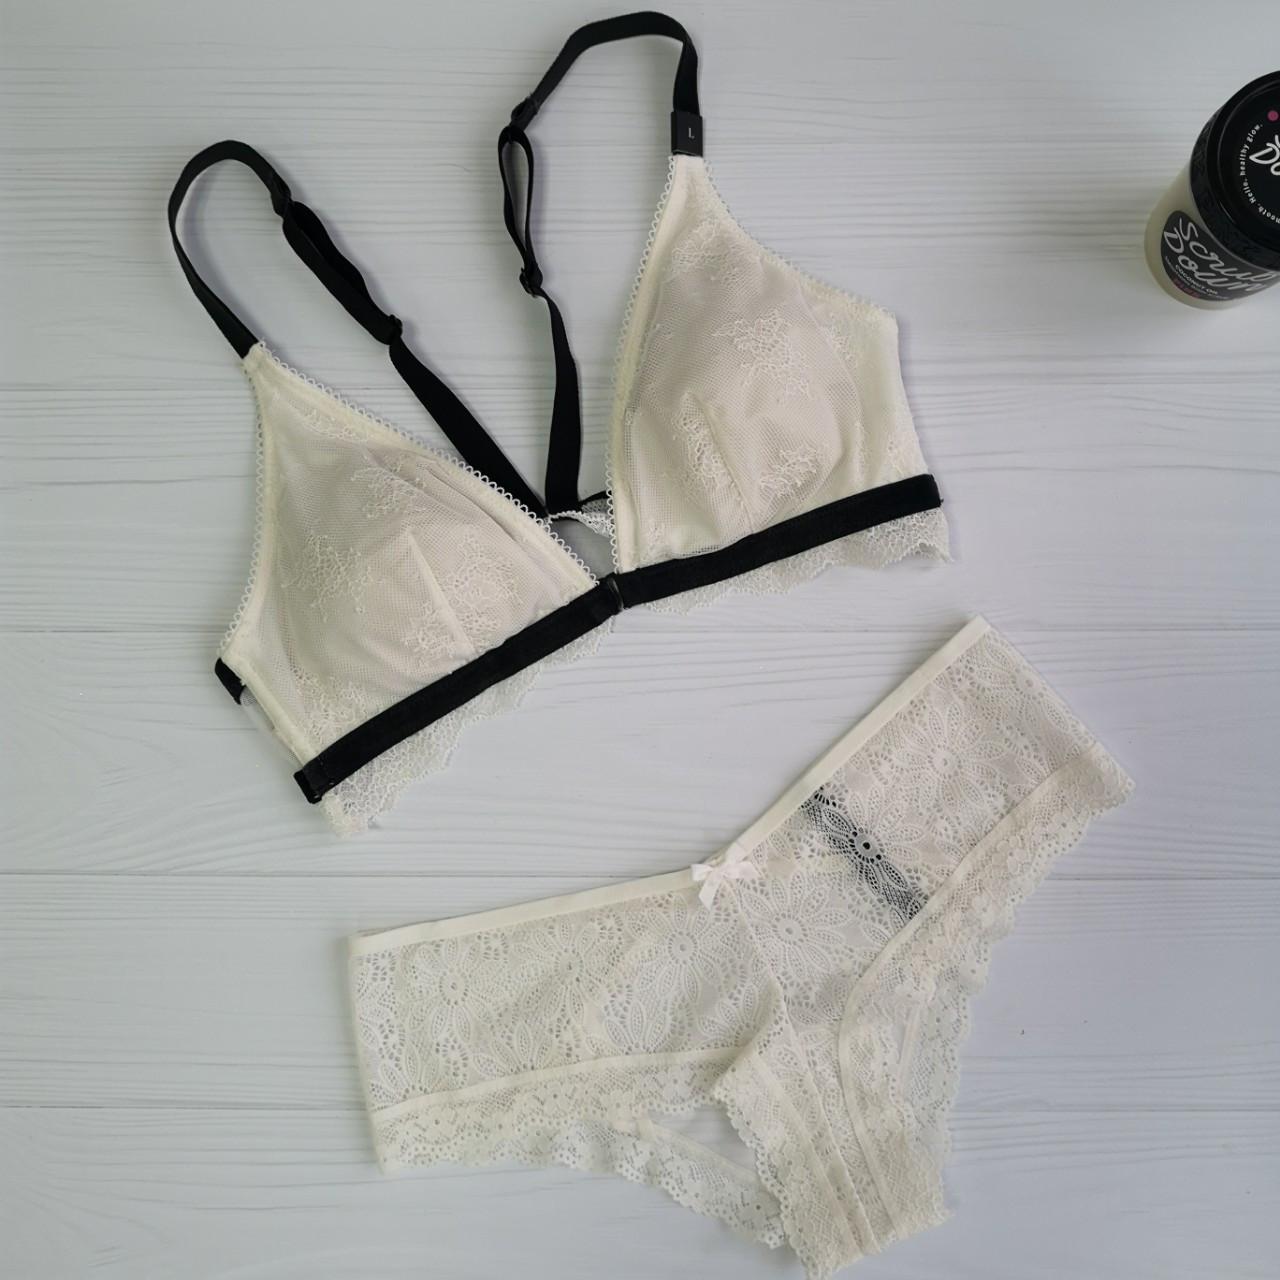 8a6ac2703f146 Комплект Белья (бралетт+трусики) Victoria's Secret! Размер - L\M — в ...